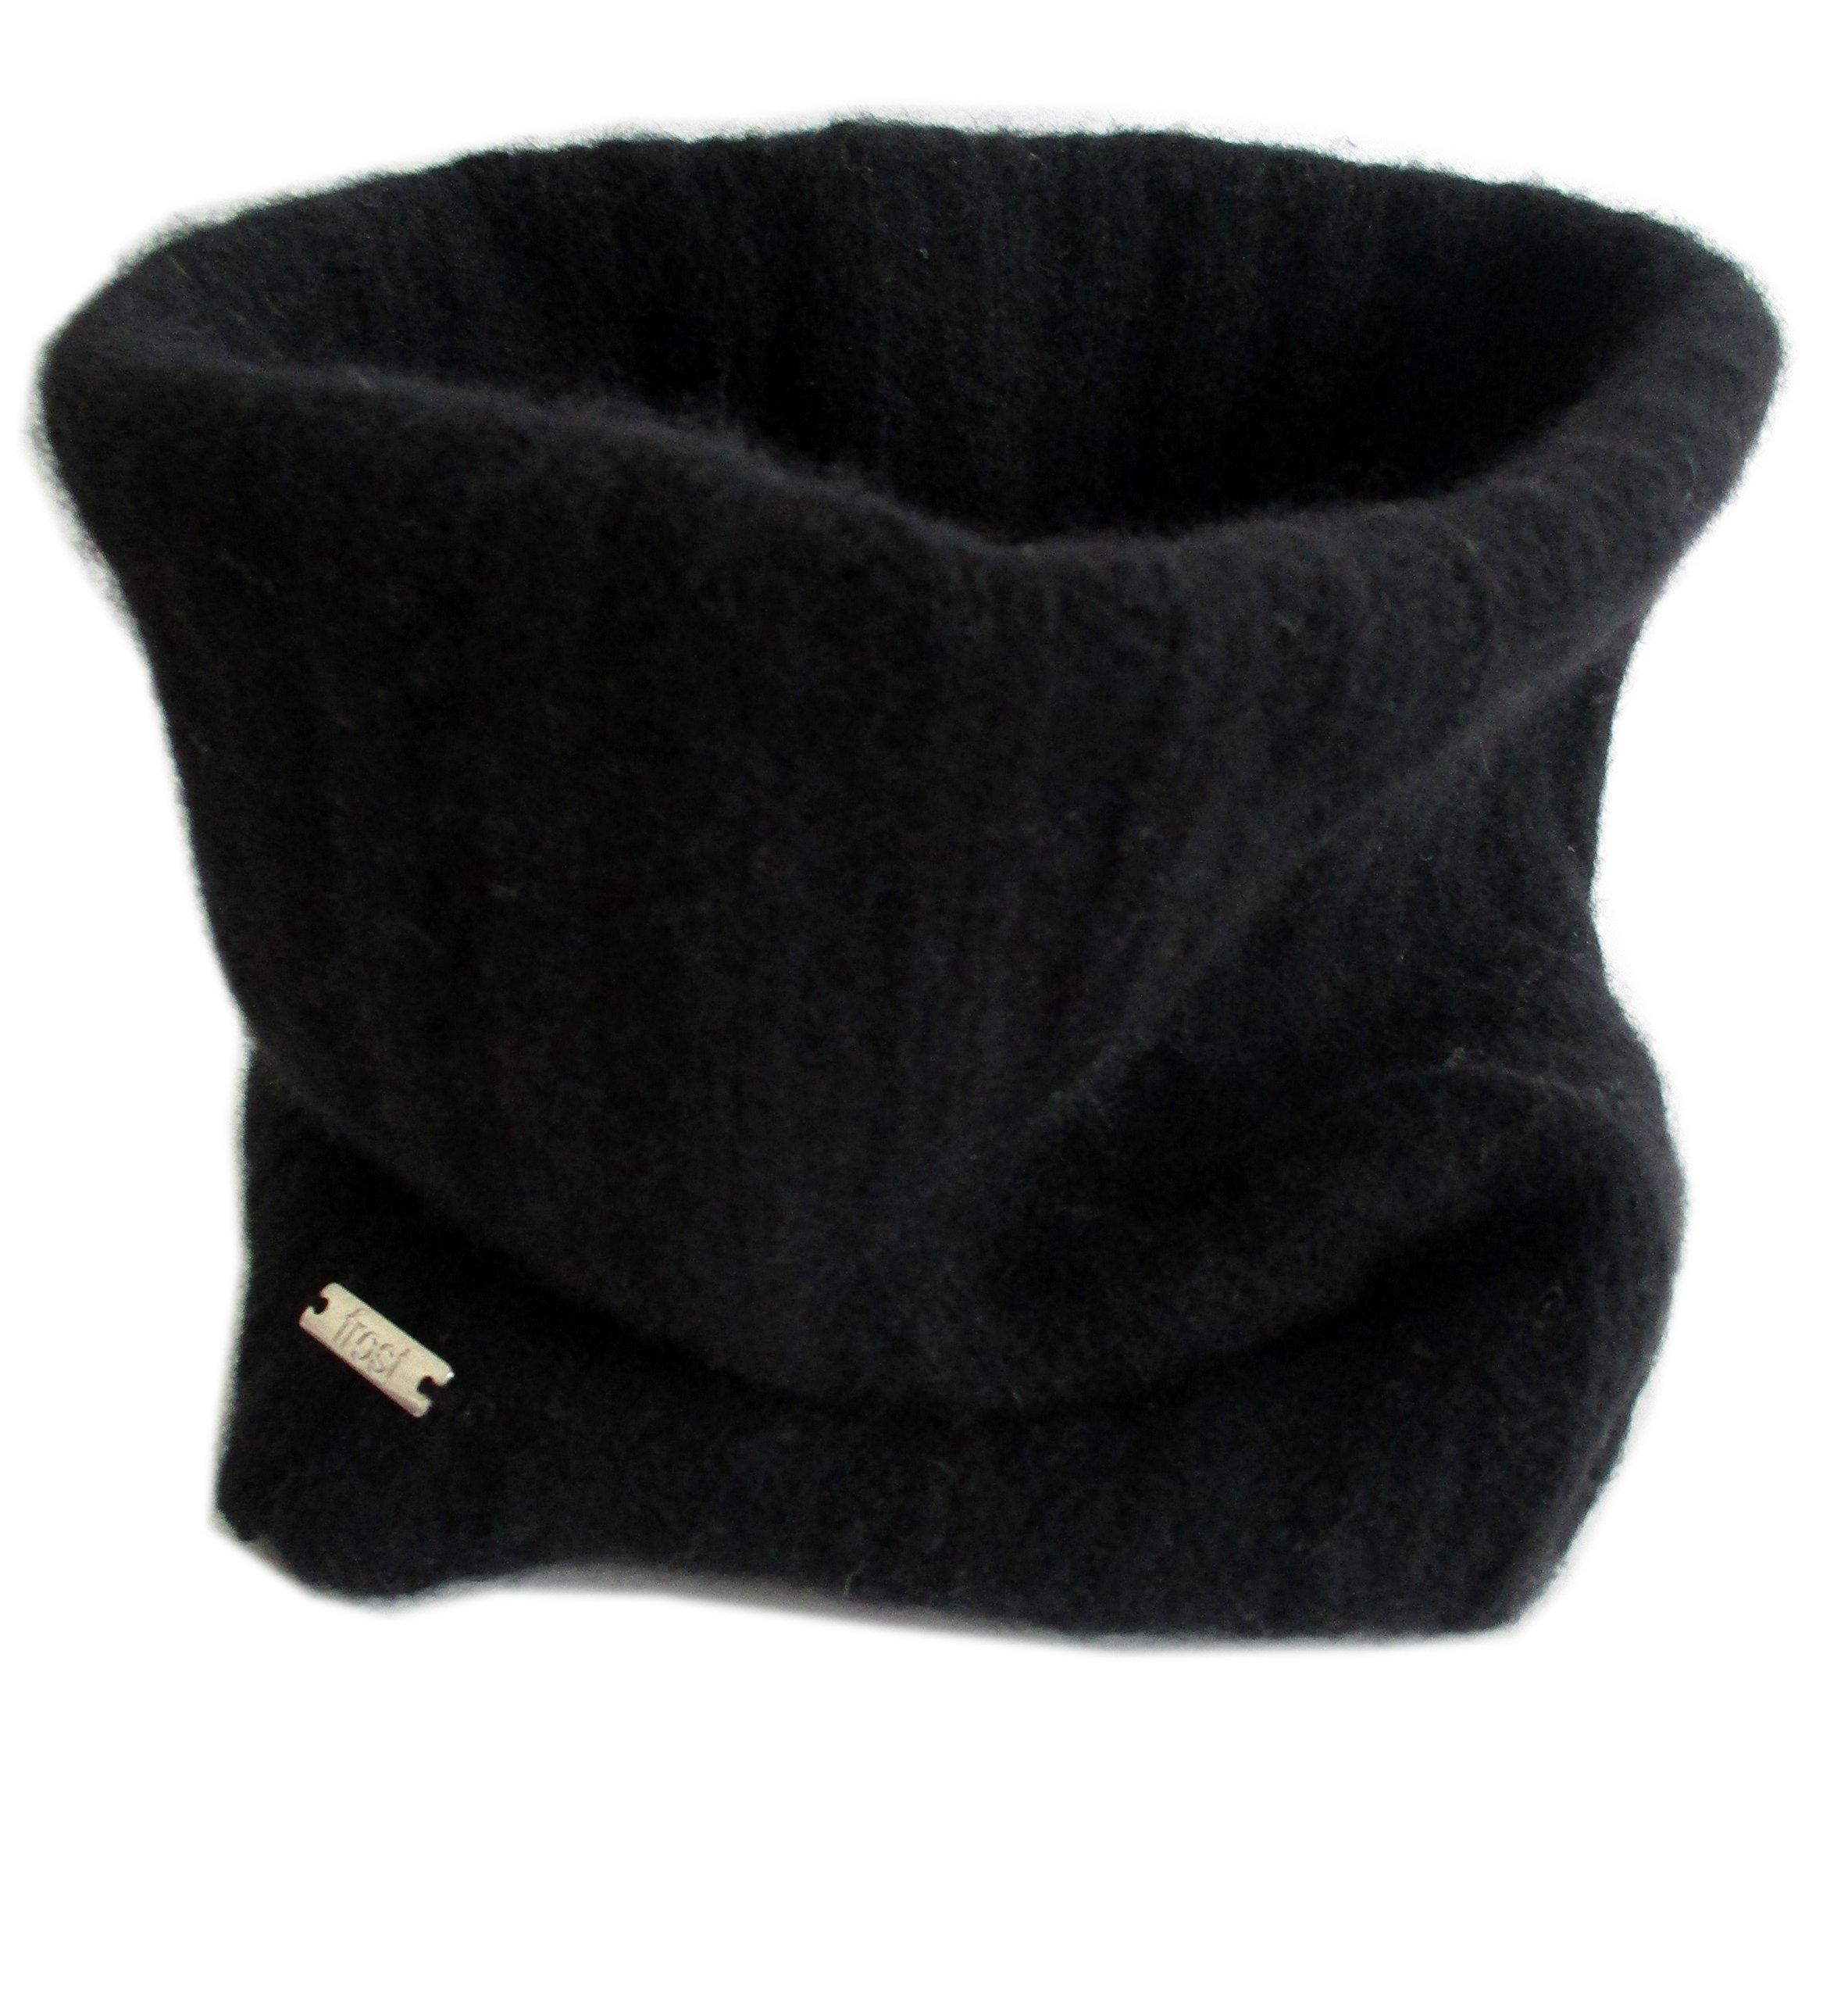 Frost Hats Cashmere Neck Warmer CSH-892 (Black)